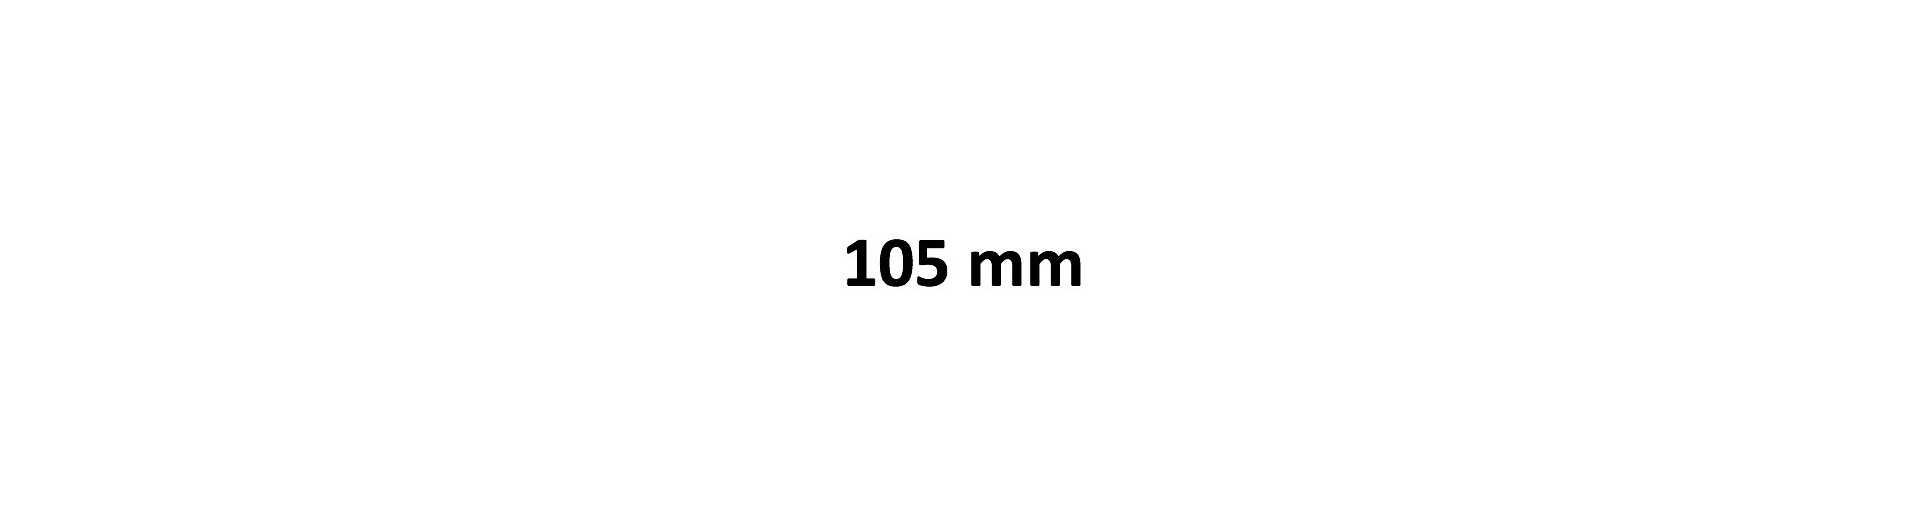 105 mm